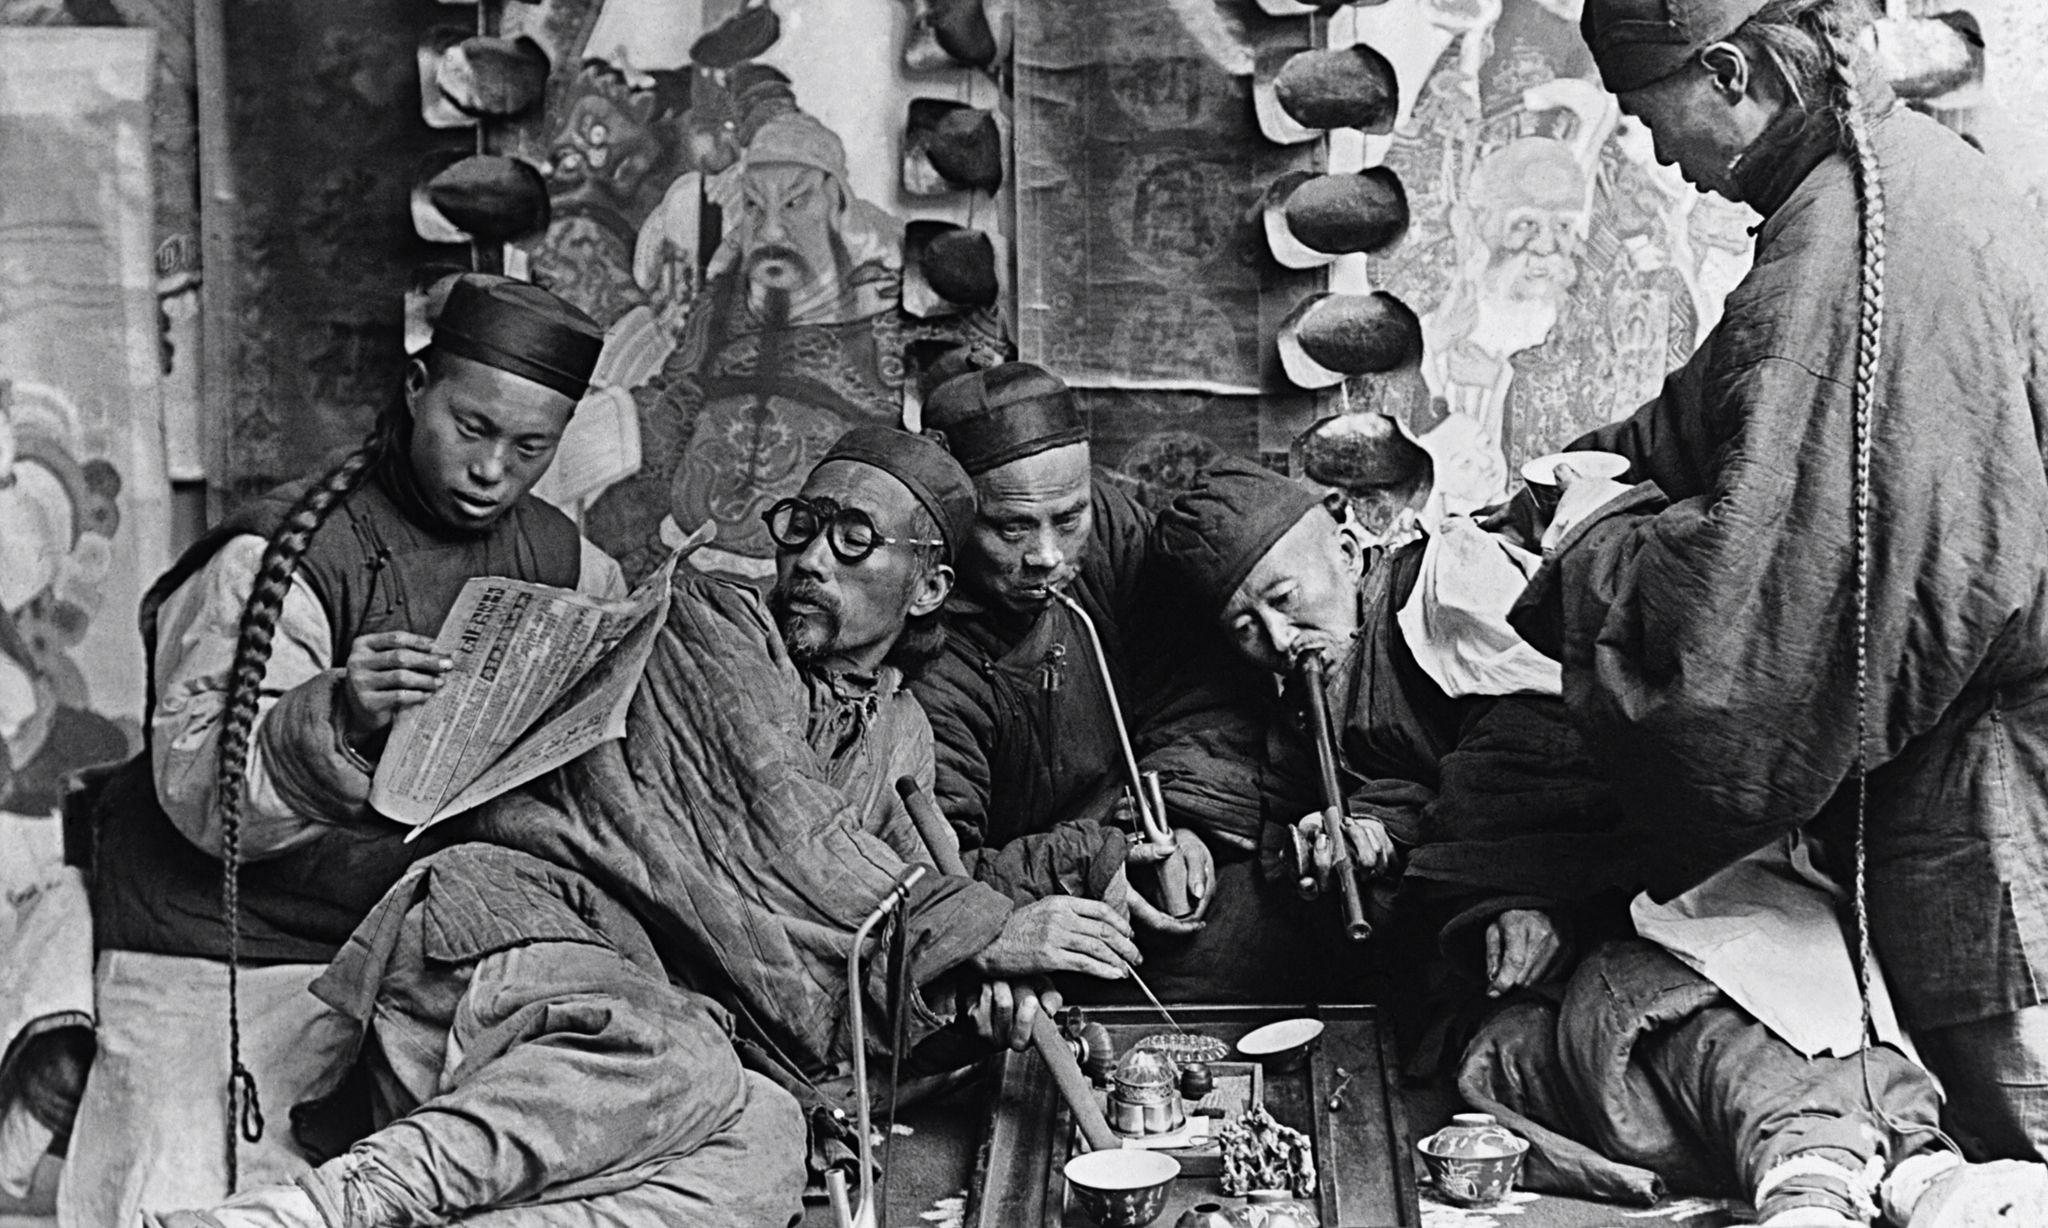 Opium den in Little Bourke street Melbourne's Chinatown. #twistedhistory #melbournemurdertours